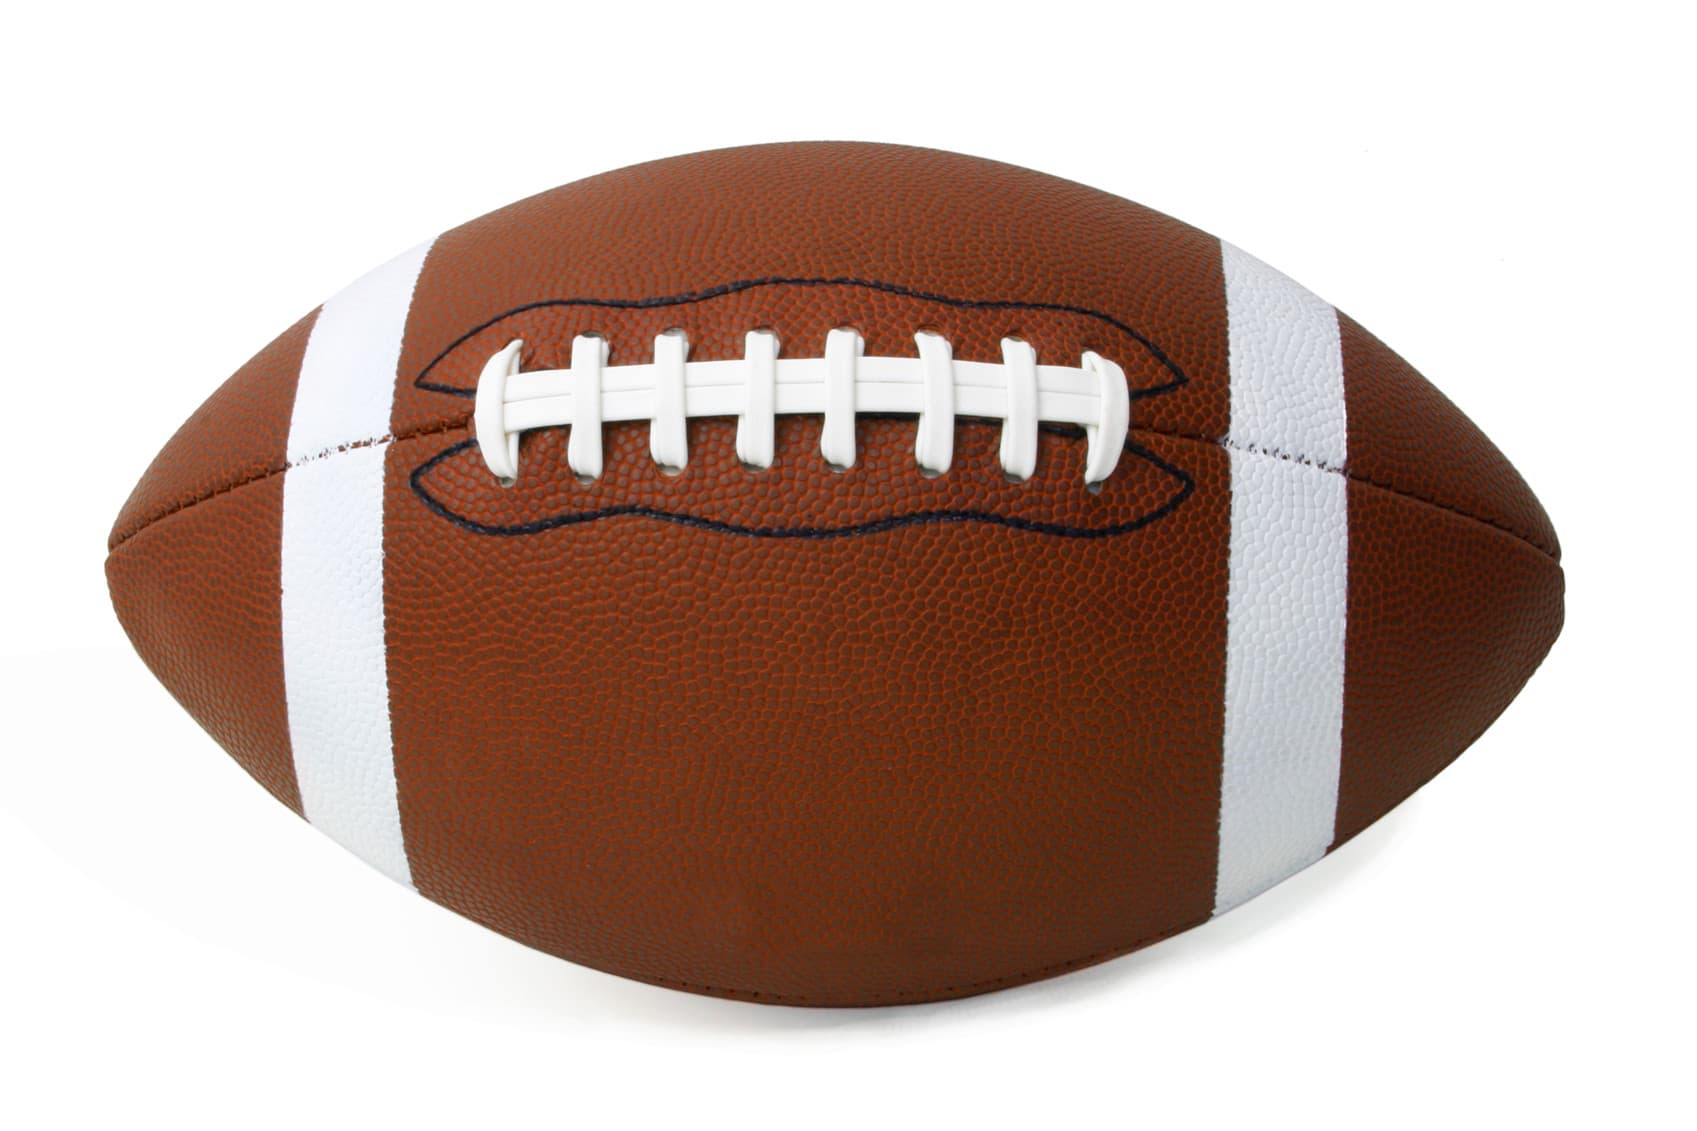 Random Most Popular Sports In America